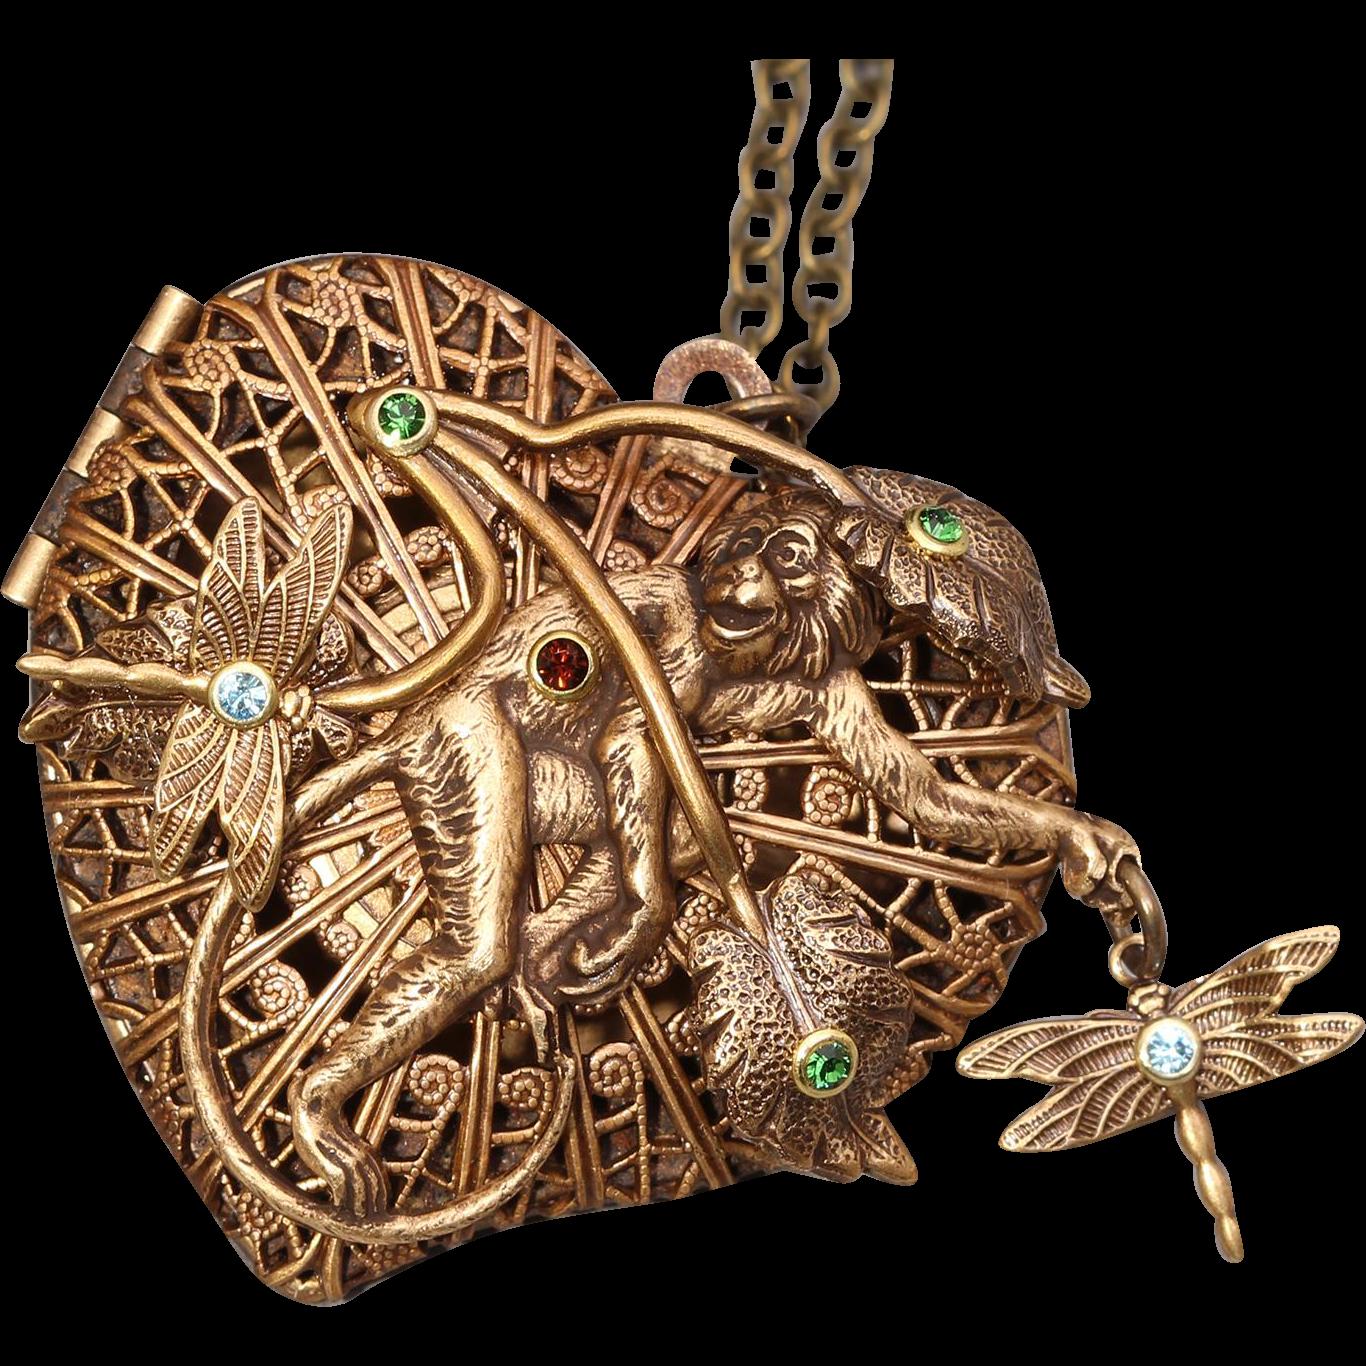 Monkey Necklace Heart Locket Necklace Compass Necklace